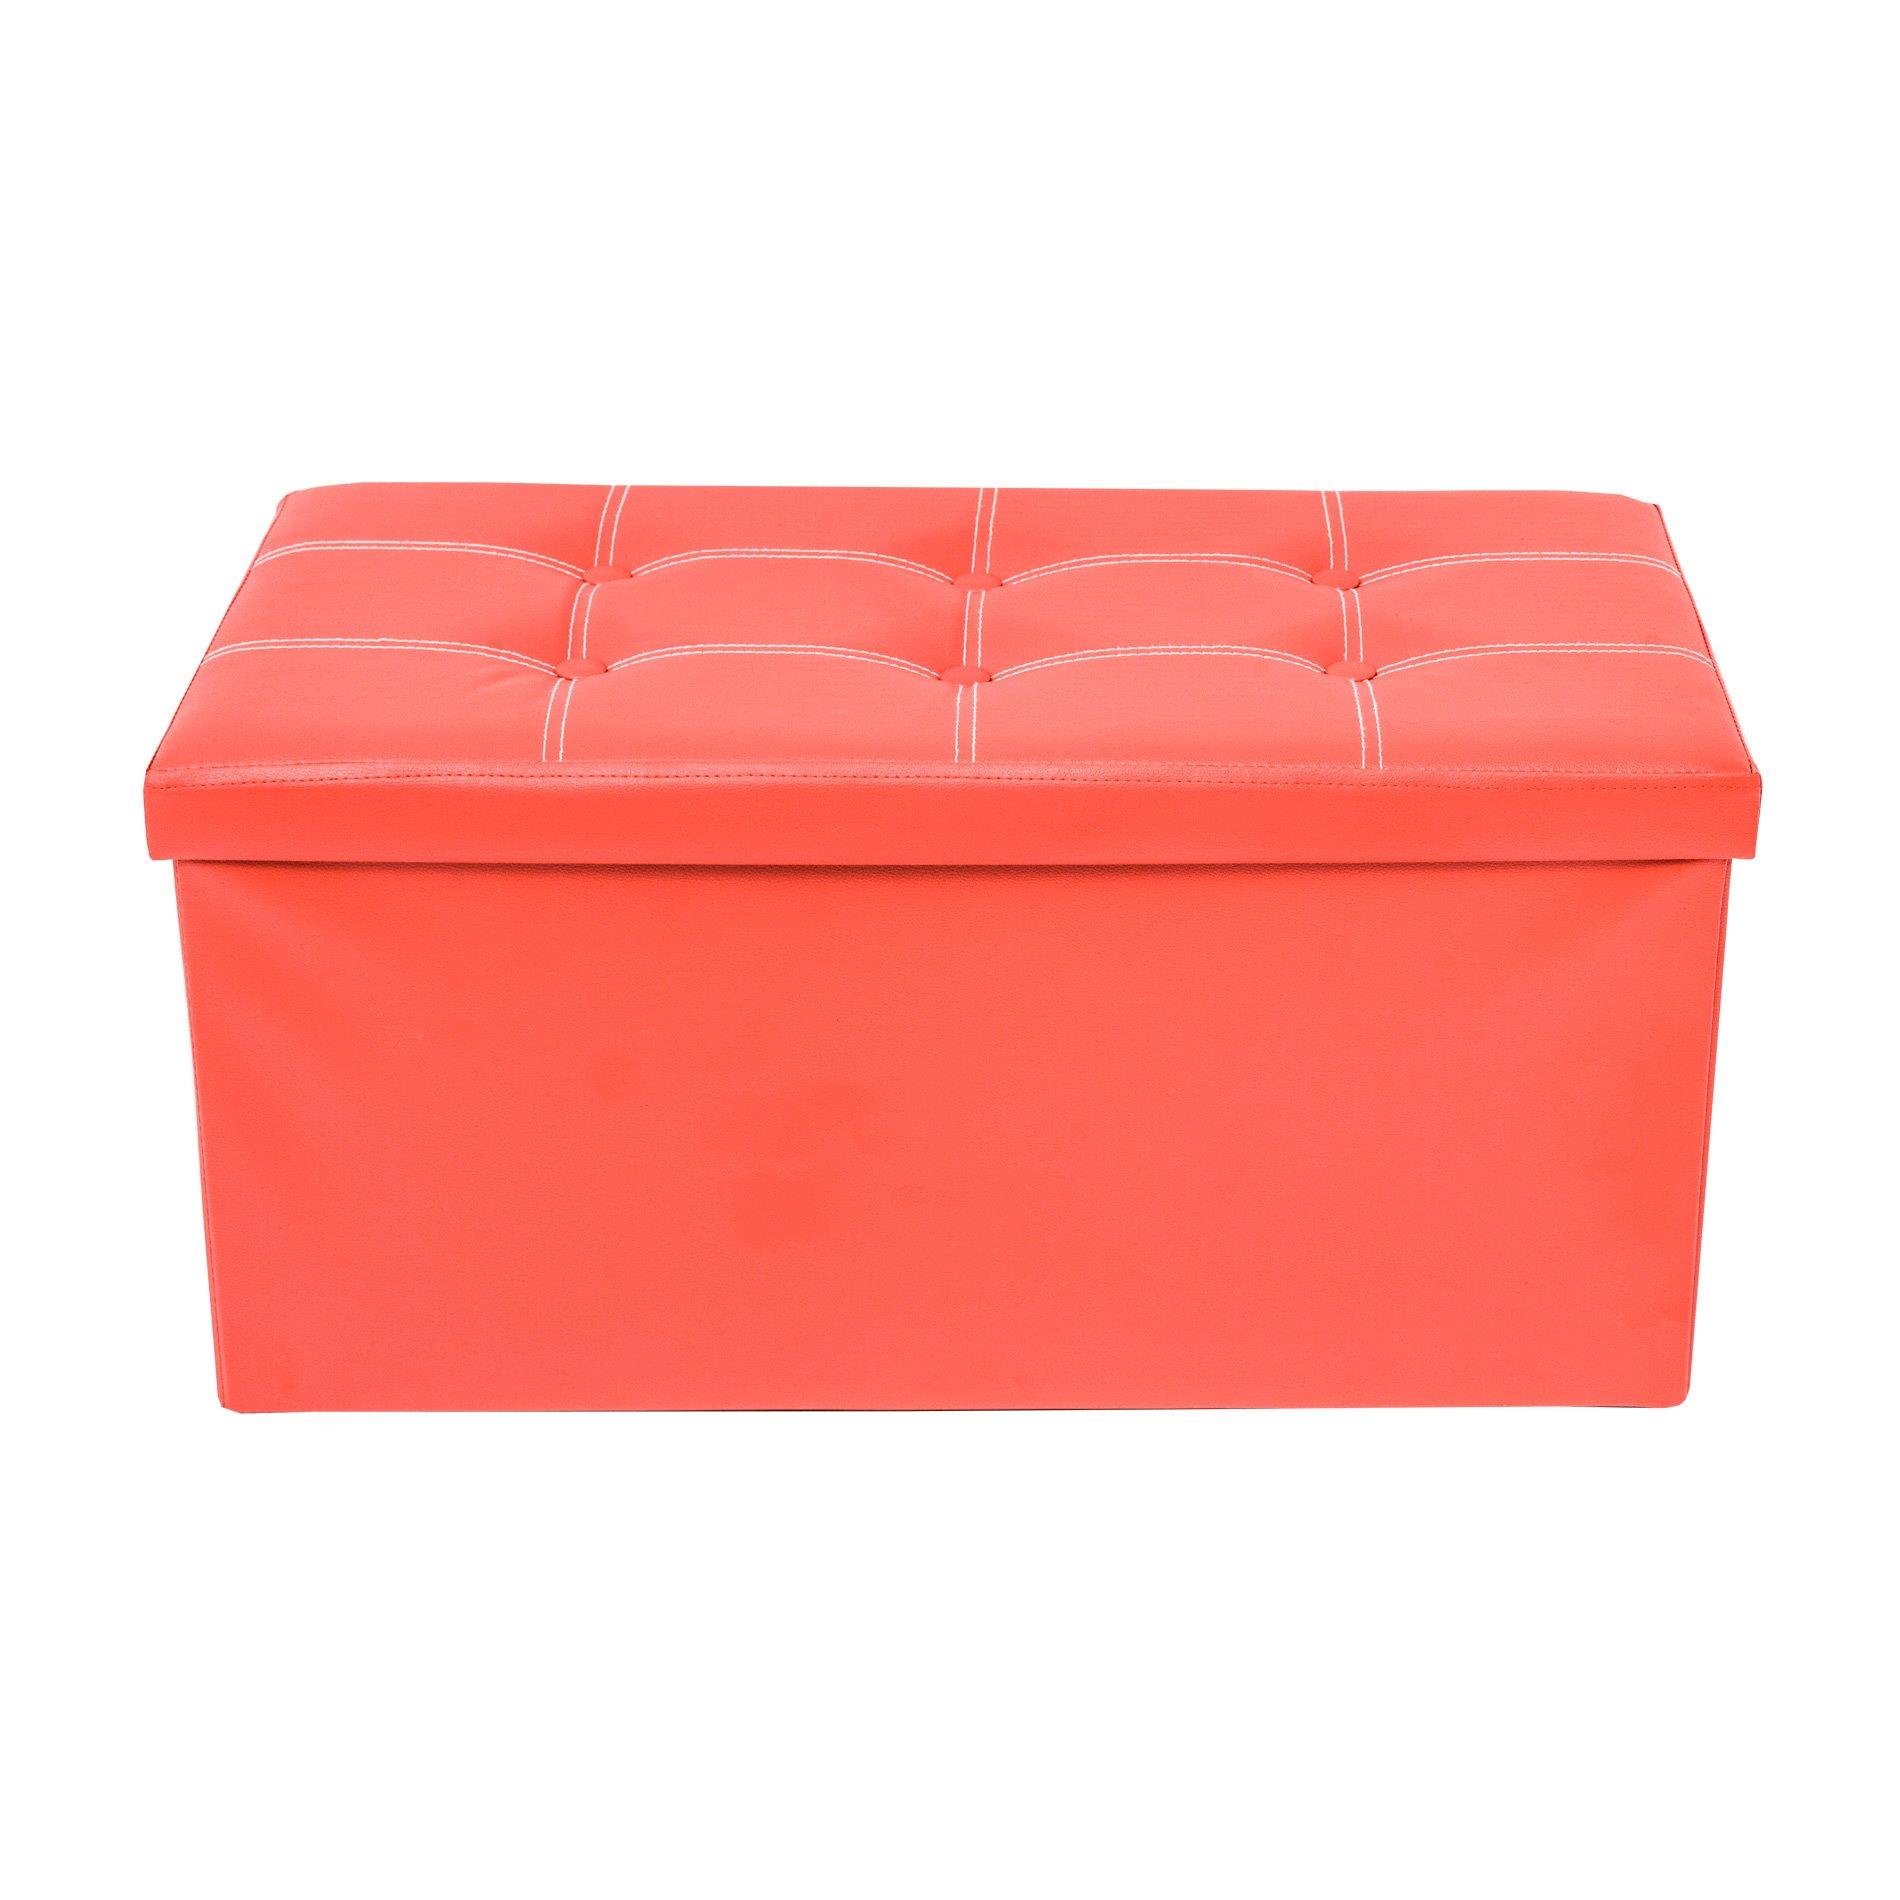 Rebecca Mobili Puff Asiento Baúl Polipiel Taburete Rojo almacenaje Asiento Moderno Organizador casa- 38 x